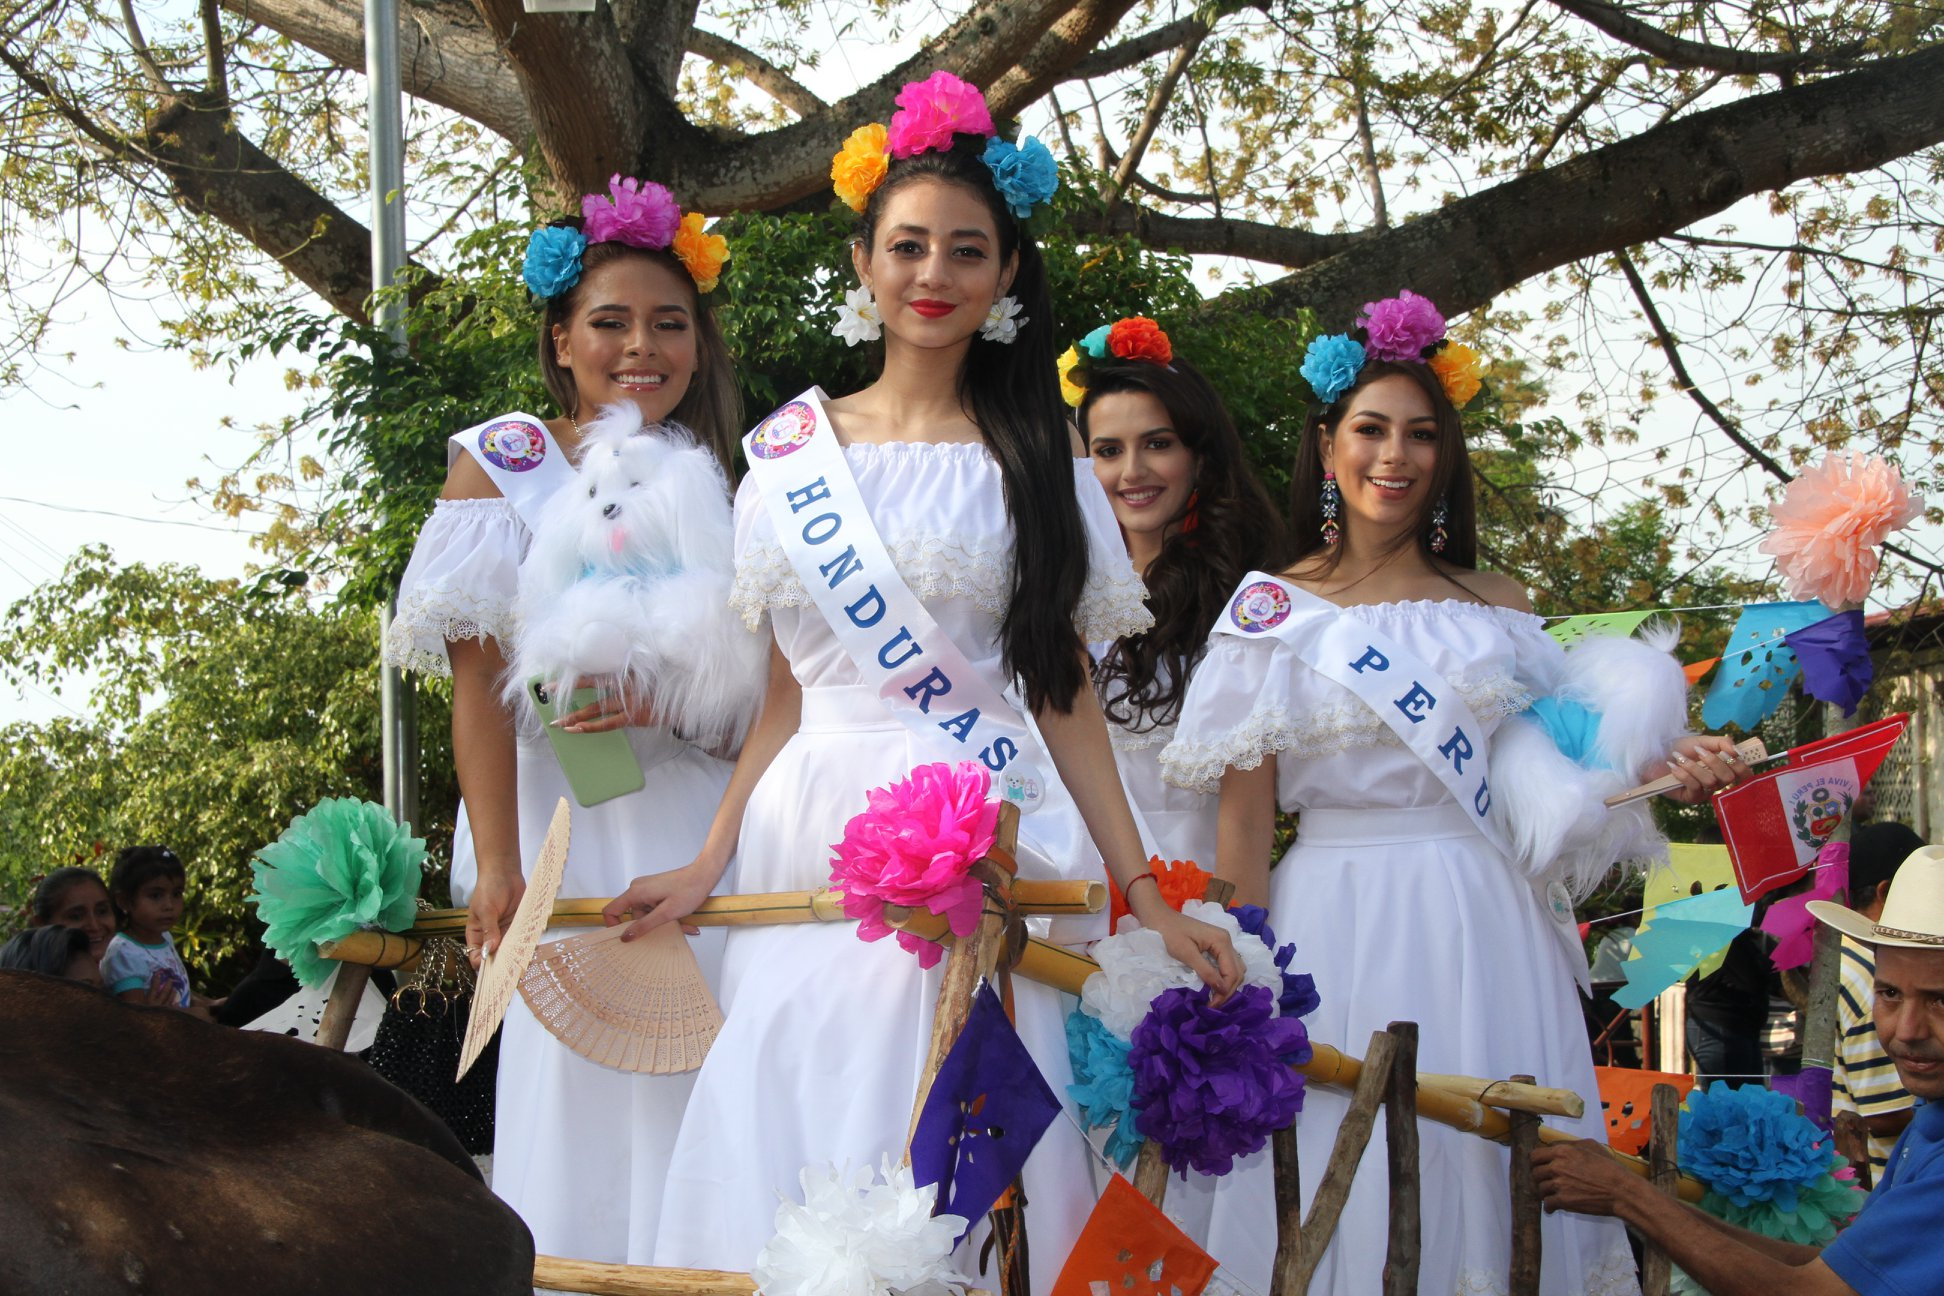 romina lopez, top 12 de miss teen mundial 2019. - Página 2 60552910